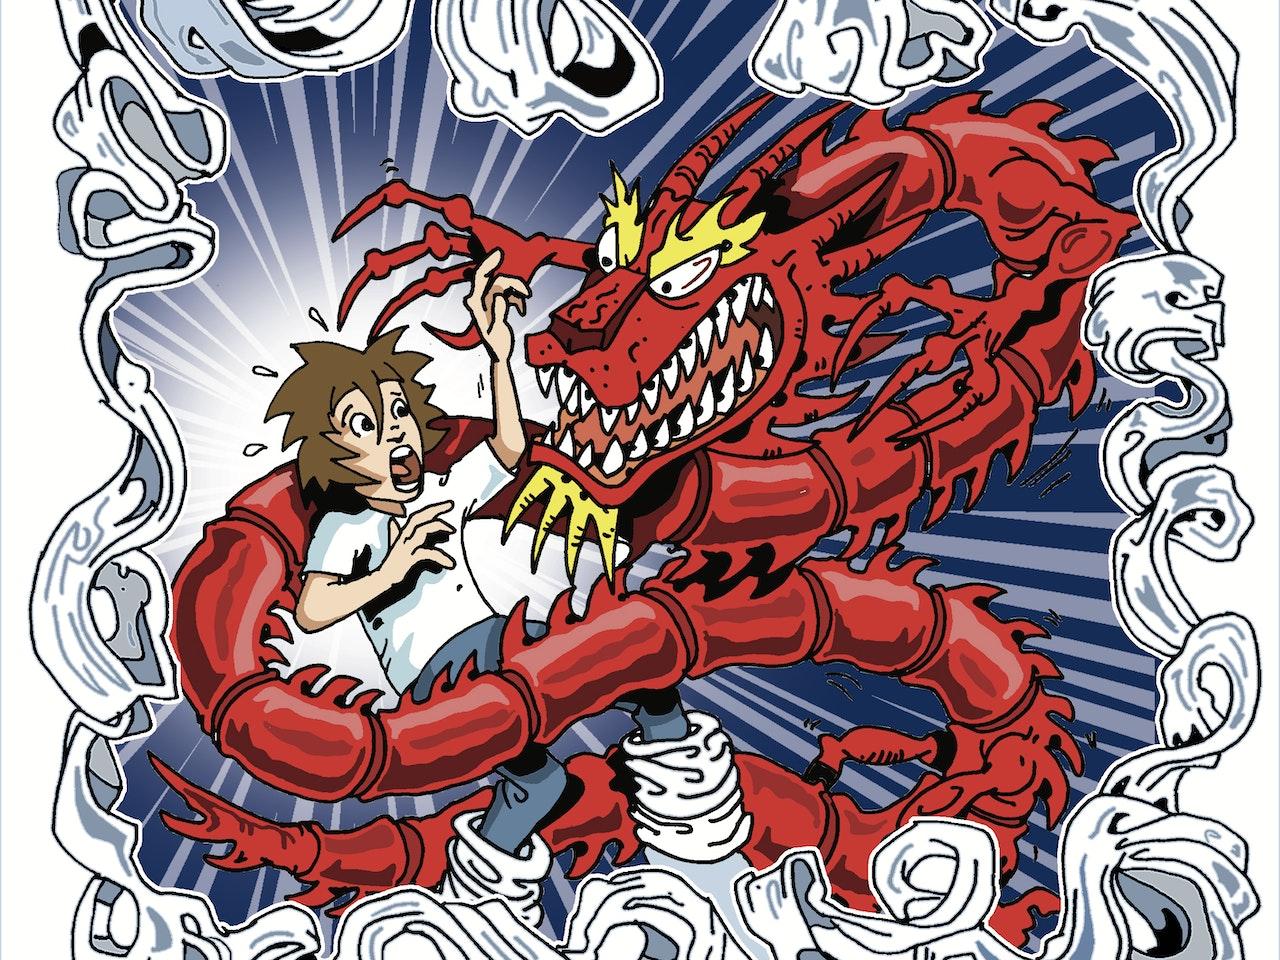 dragon dream nightmare monster serpent china legend myth martial arts kung fu fighting karate fantasy adventure Funky Happy manga anime childrens cartoon comic strip Book cover illustration animation